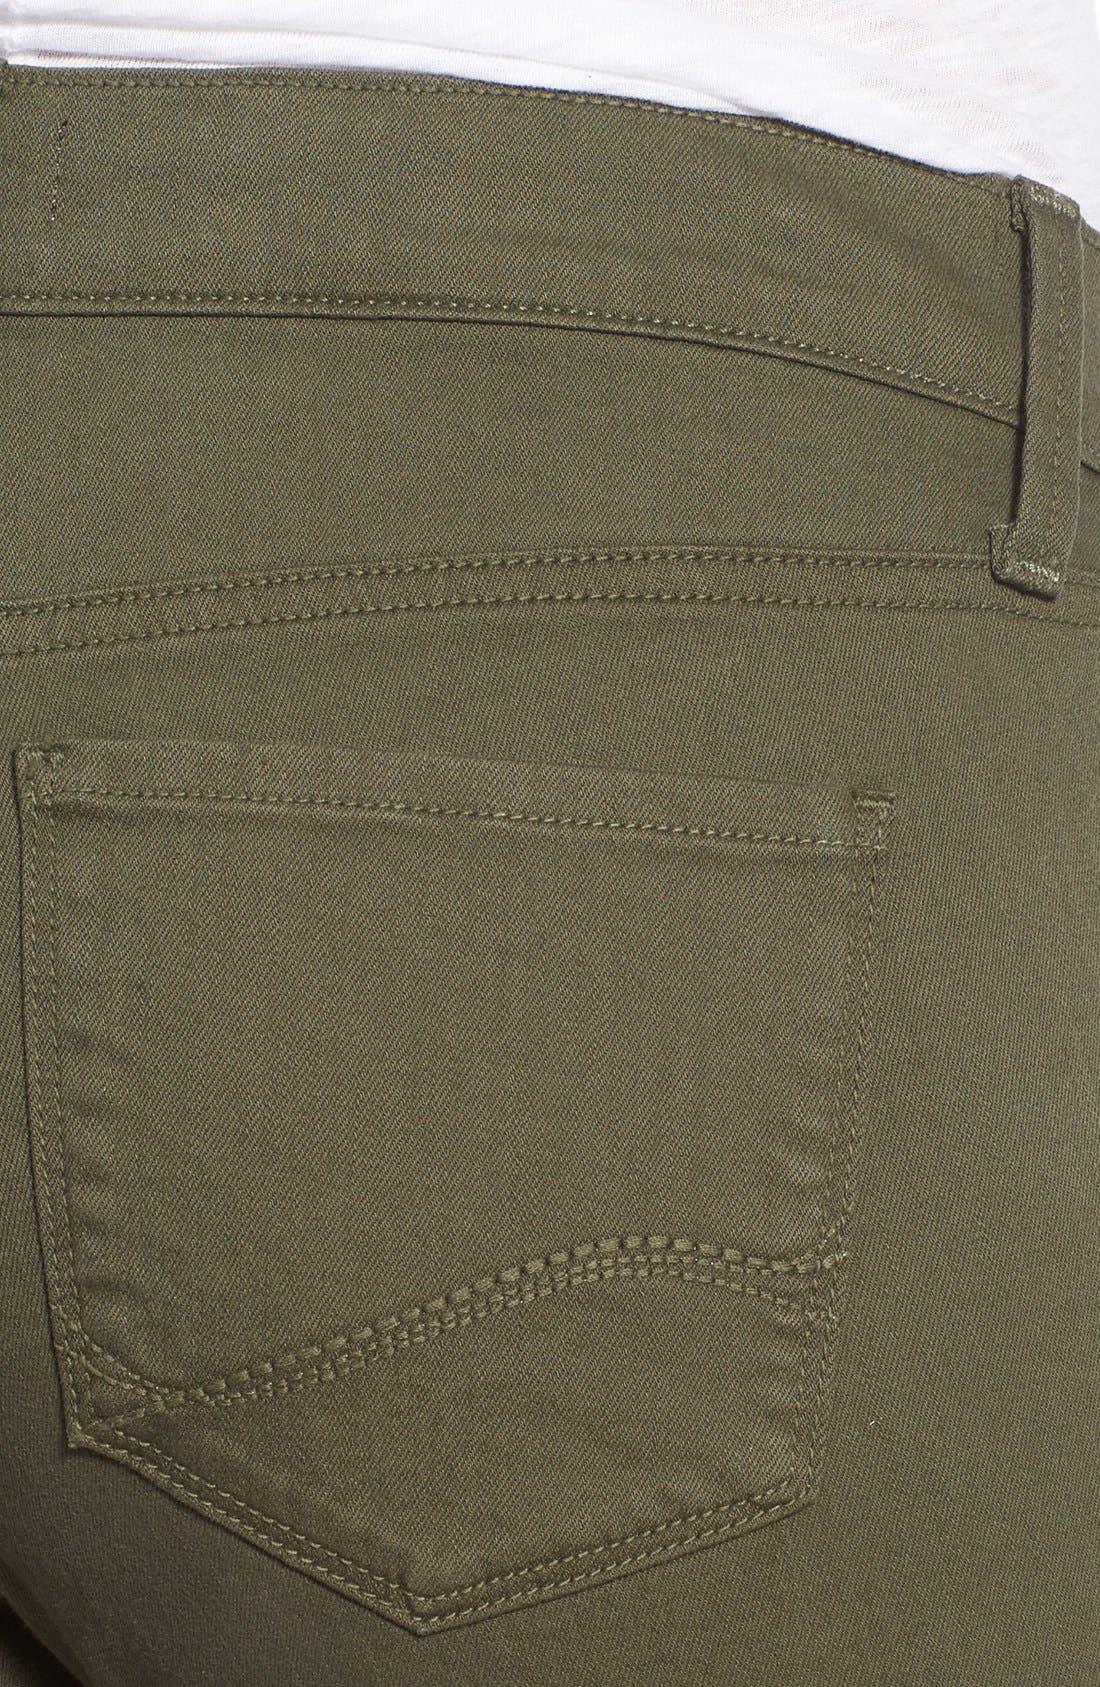 'Dayla' Colored Wide Cuff Capri Jeans,                             Alternate thumbnail 19, color,